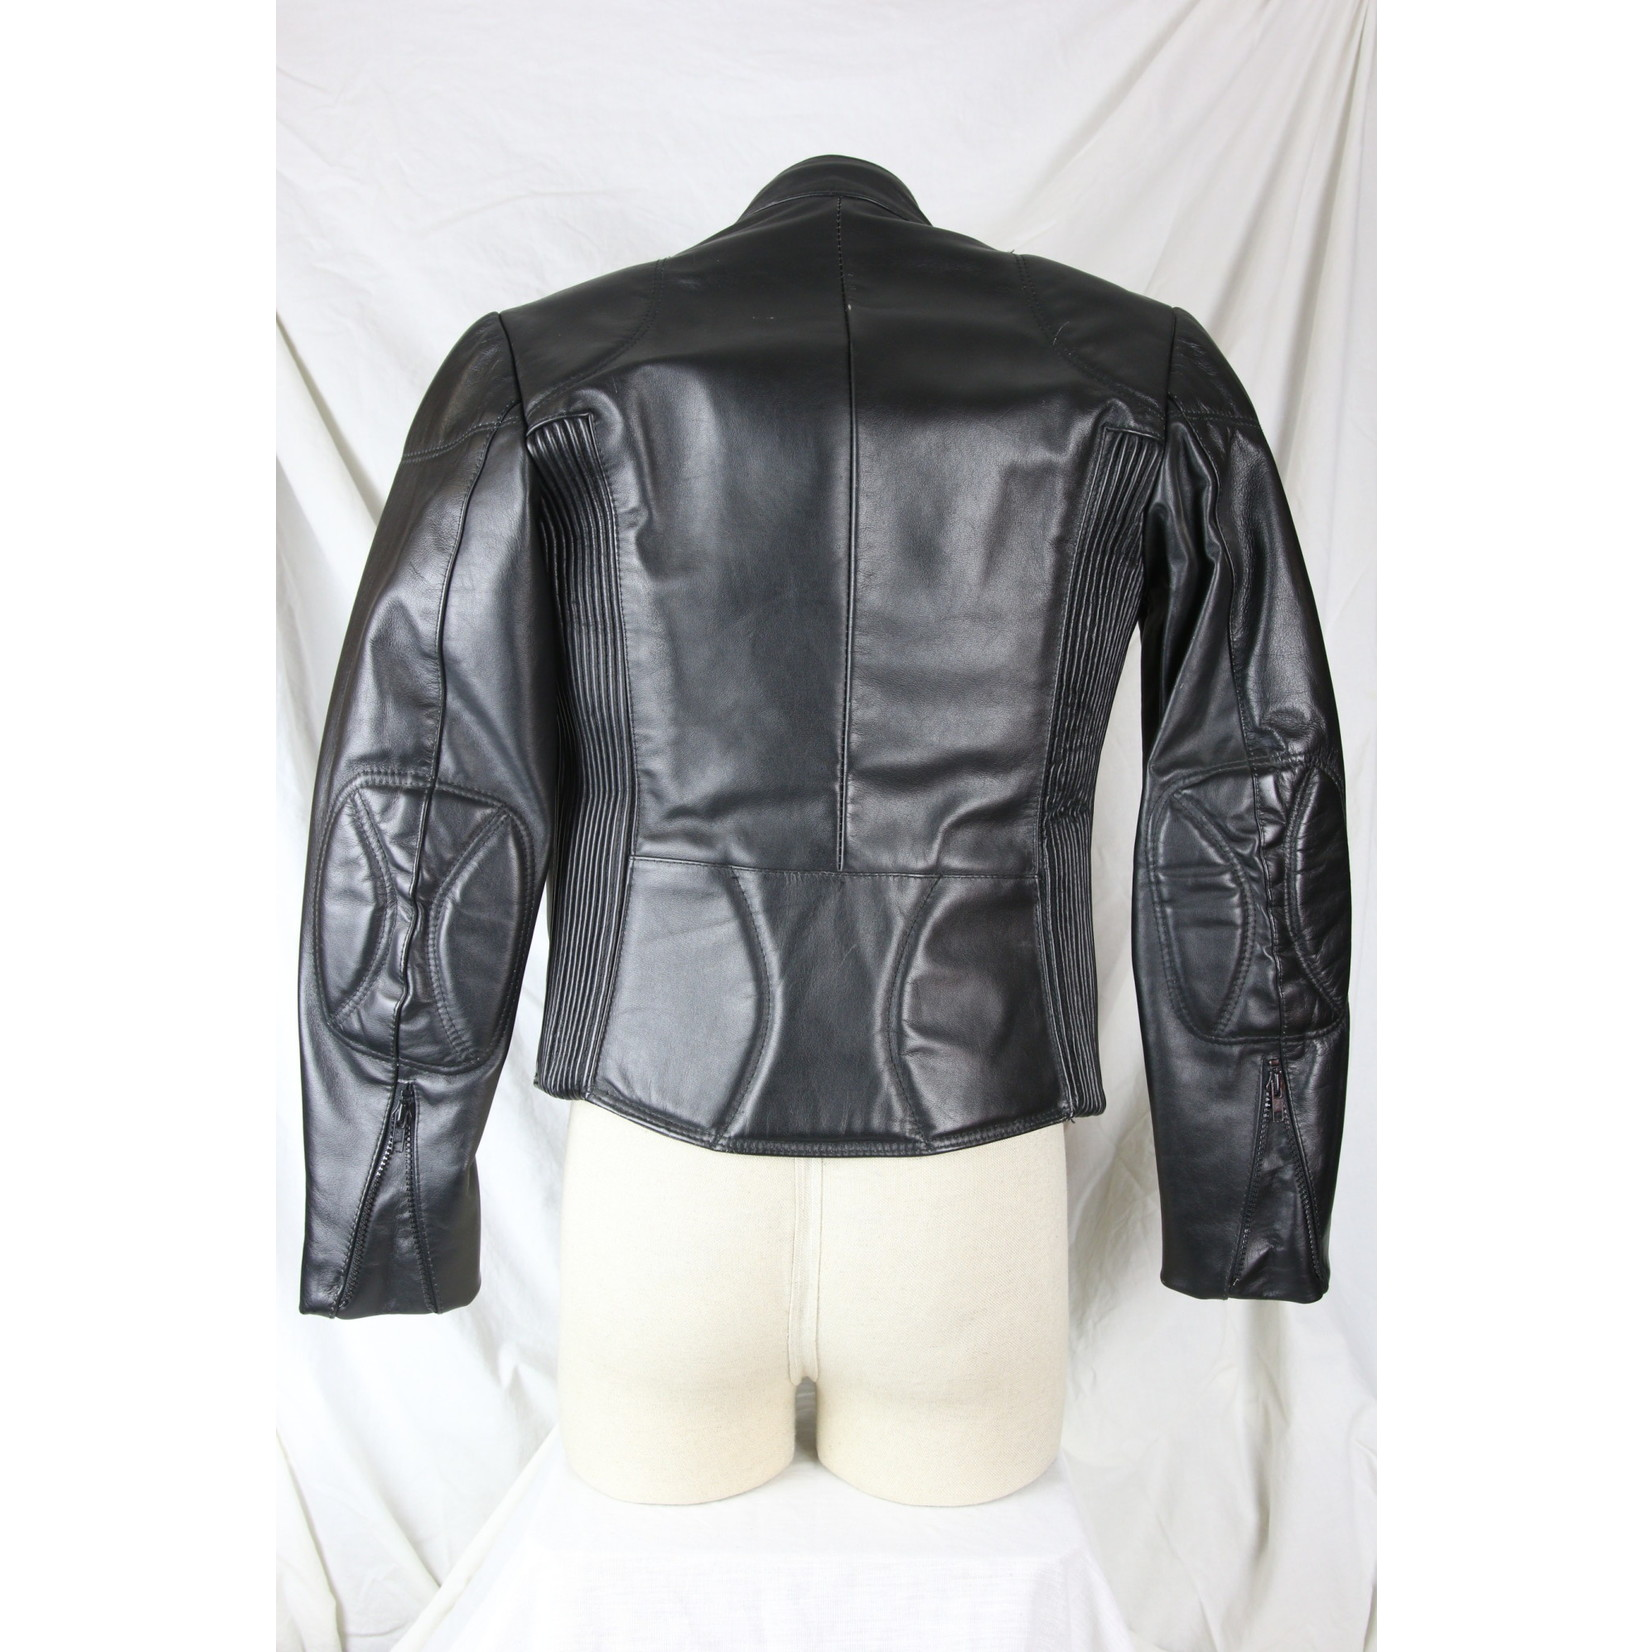 Bristol Men's Leather Black Biker Jacket Right Side Zip 1044